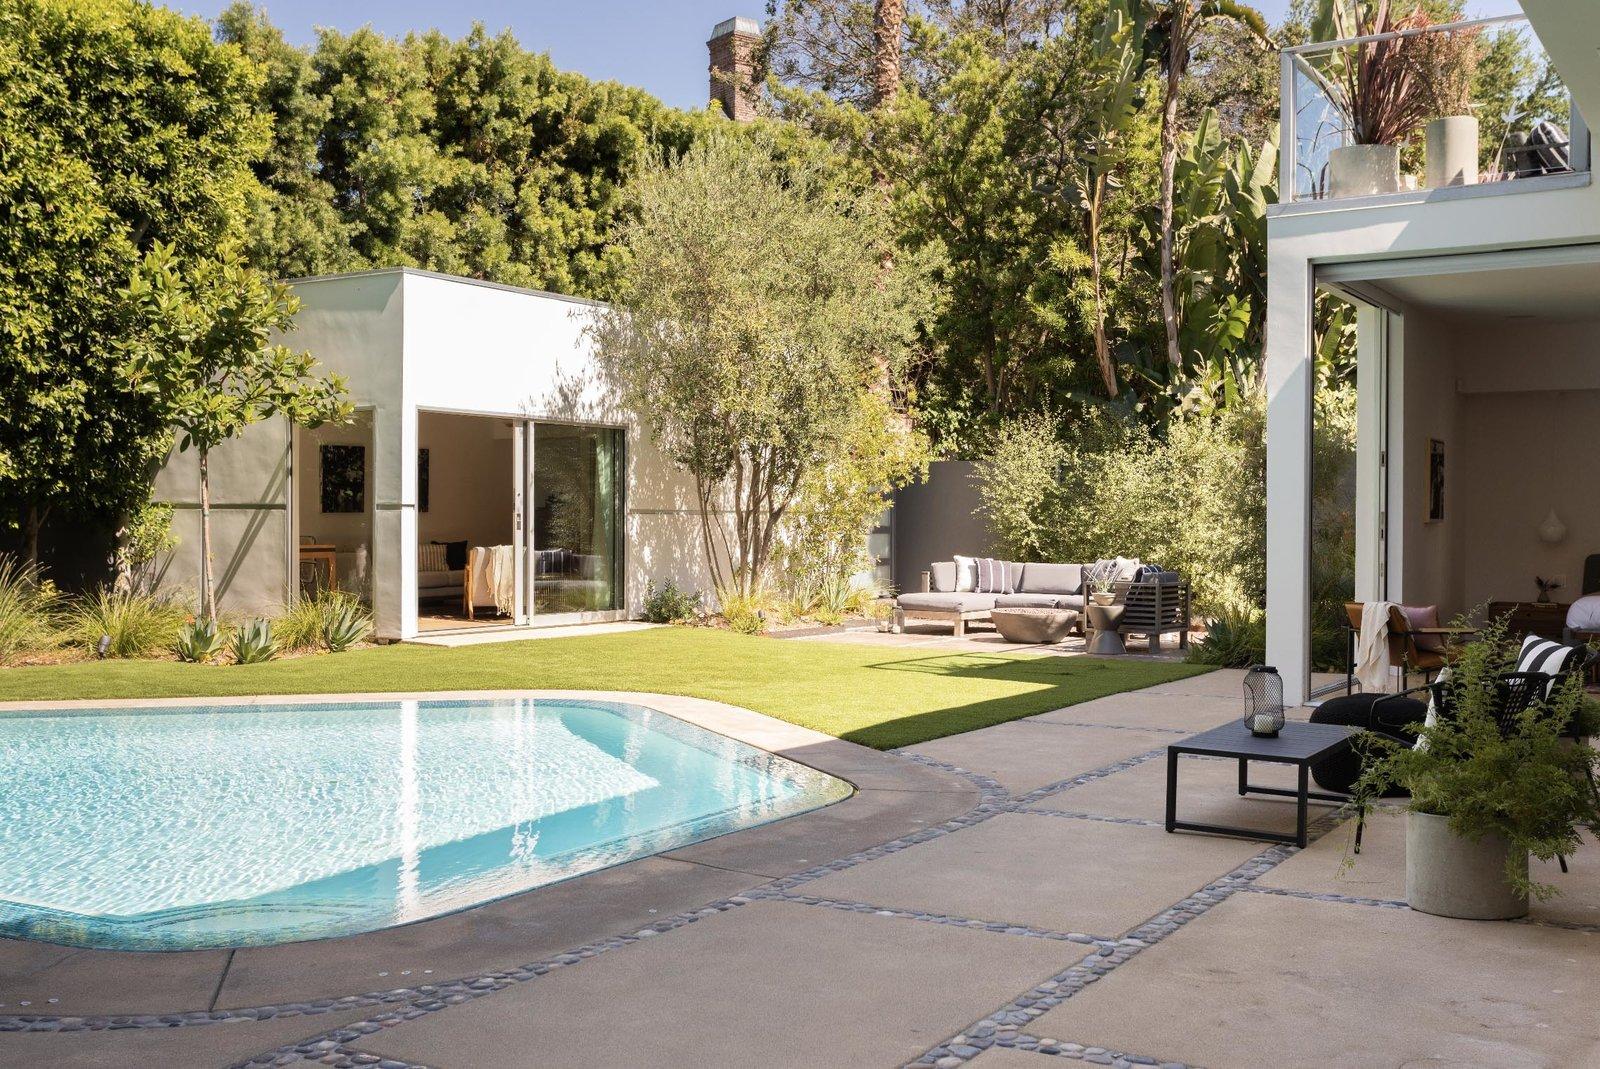 Bruno Bondanelli Los Angeles home backyard